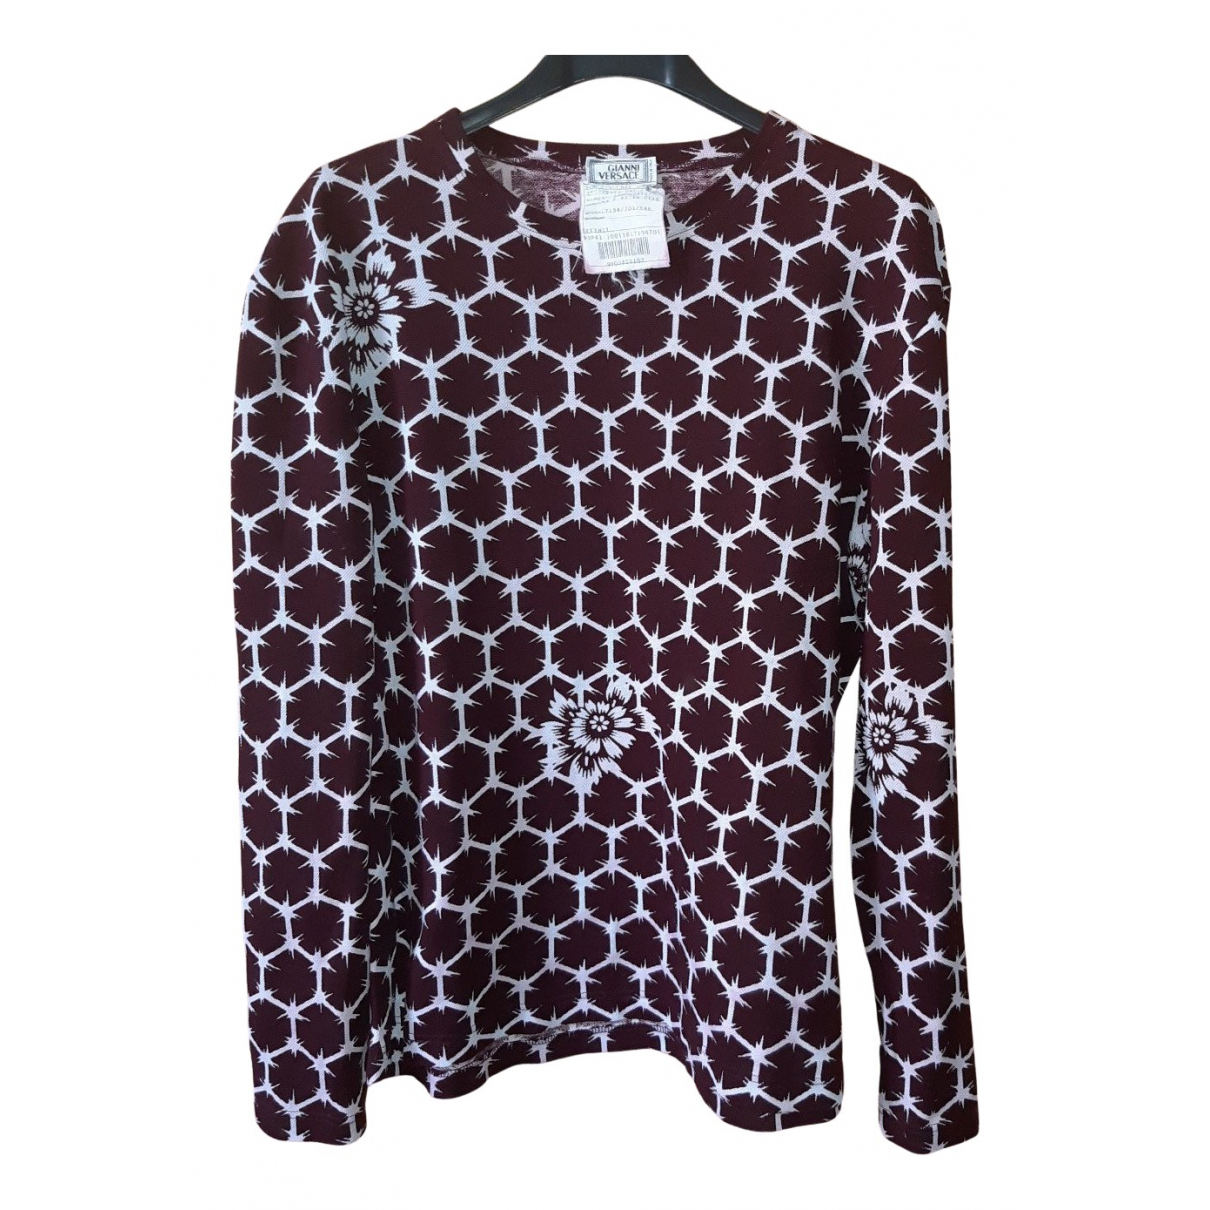 Gianni Versace \N Burgundy T-shirts for Men L International